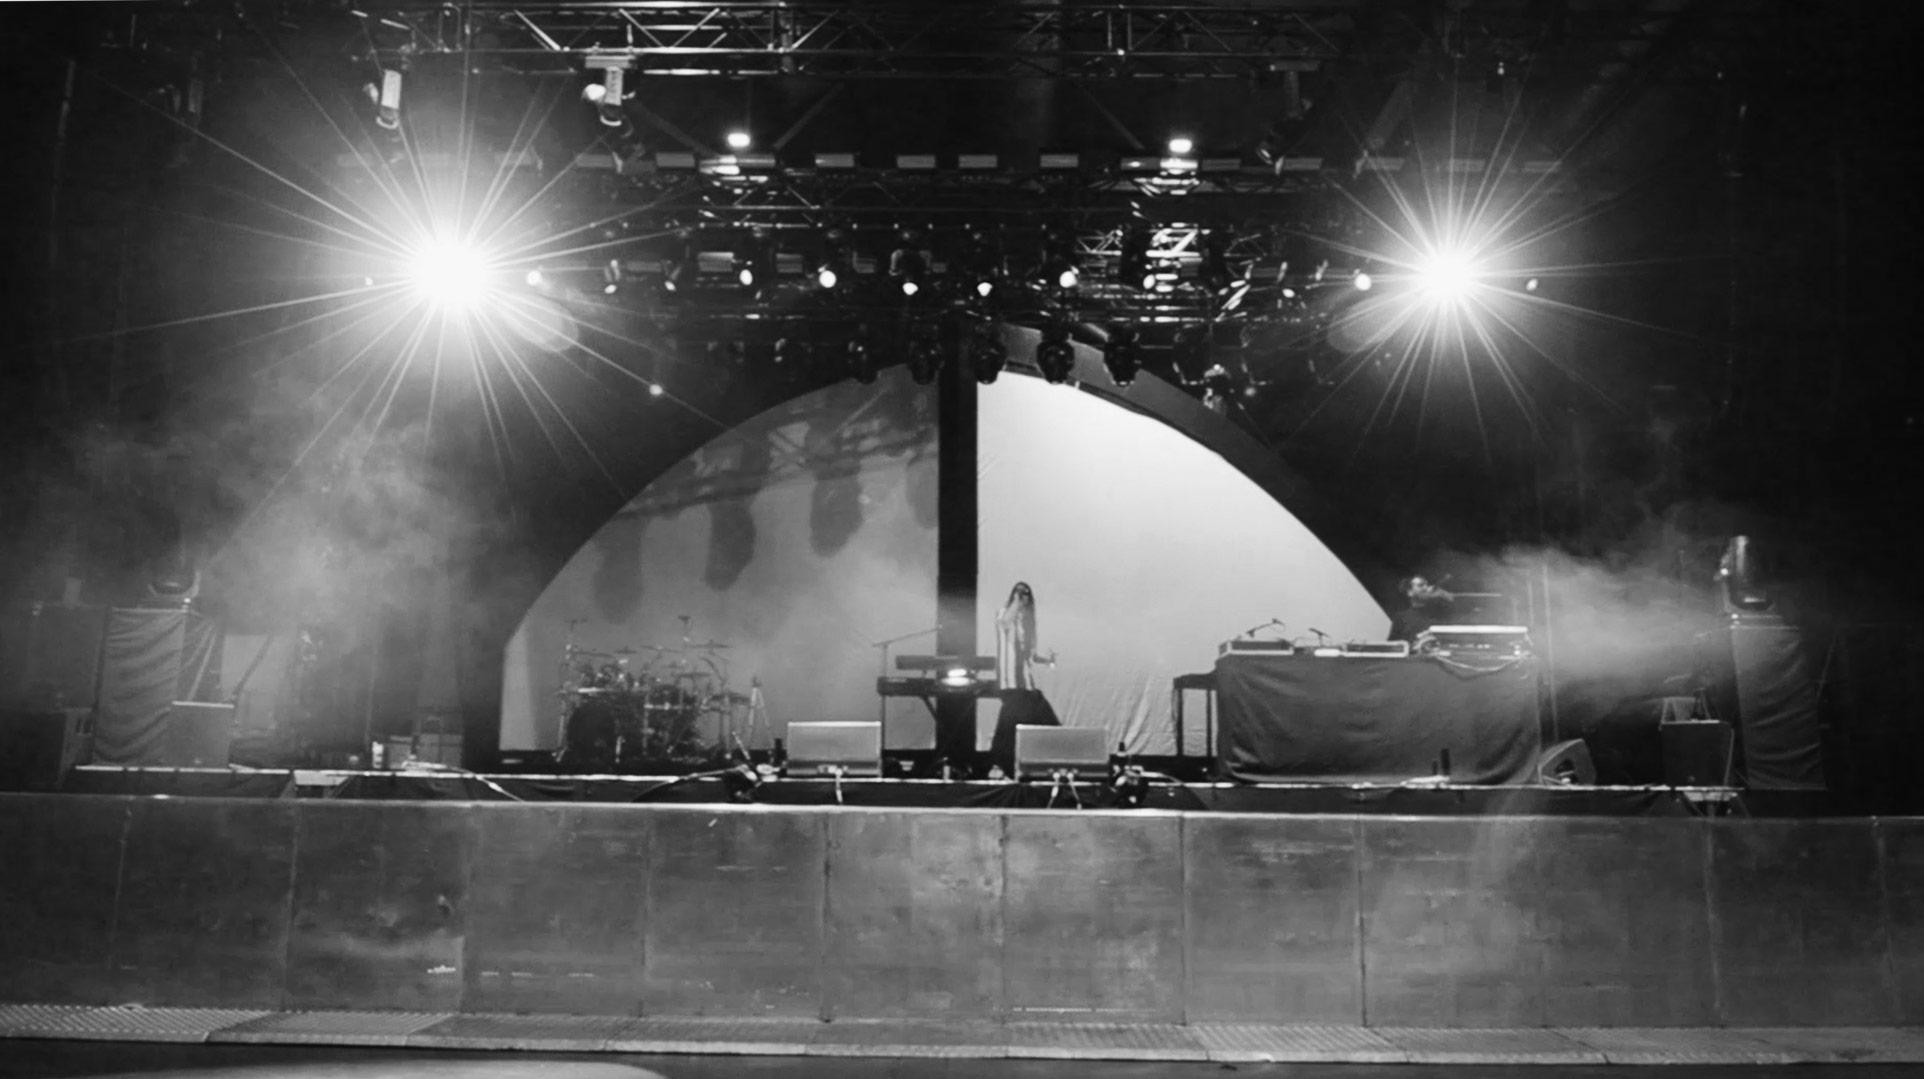 Niklas Nischke - Yung Pinch G-Eazy Berlin Tourtsop 02.jpg